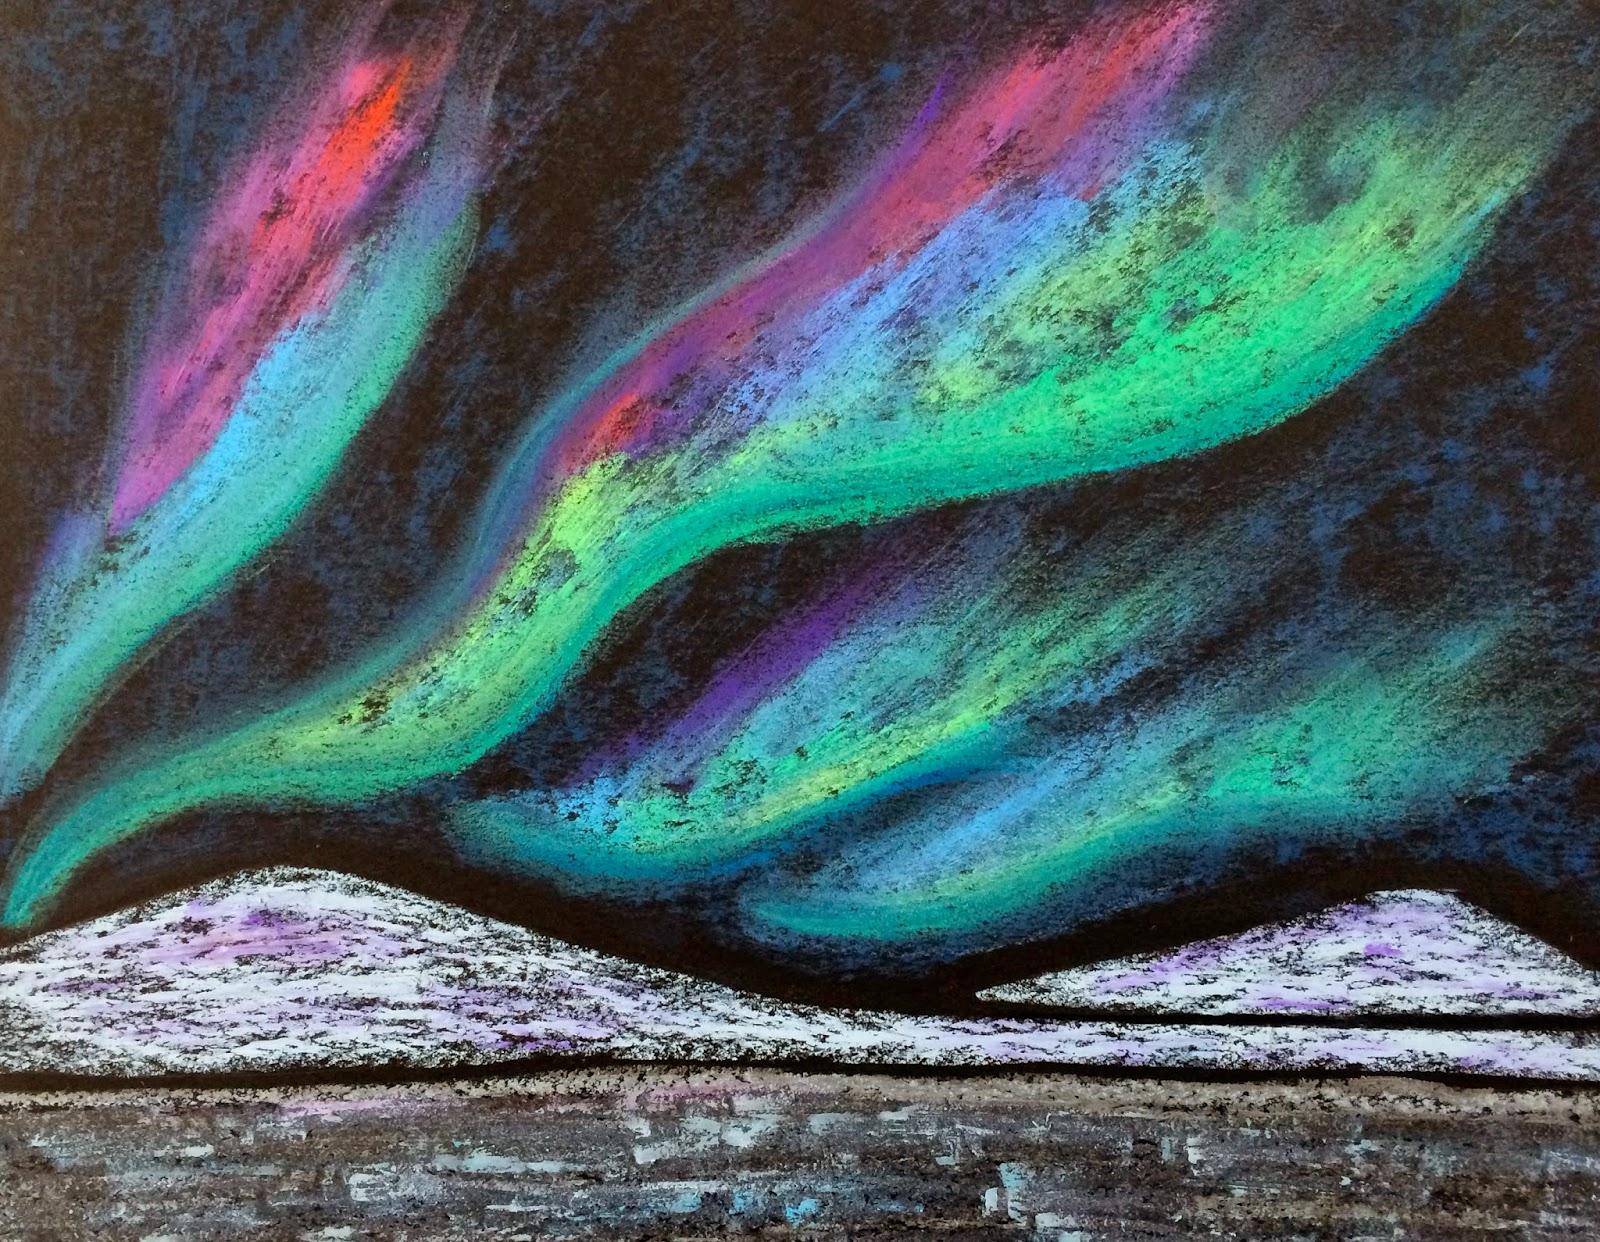 kathy s angelnik designs art project ideas northern lights winter